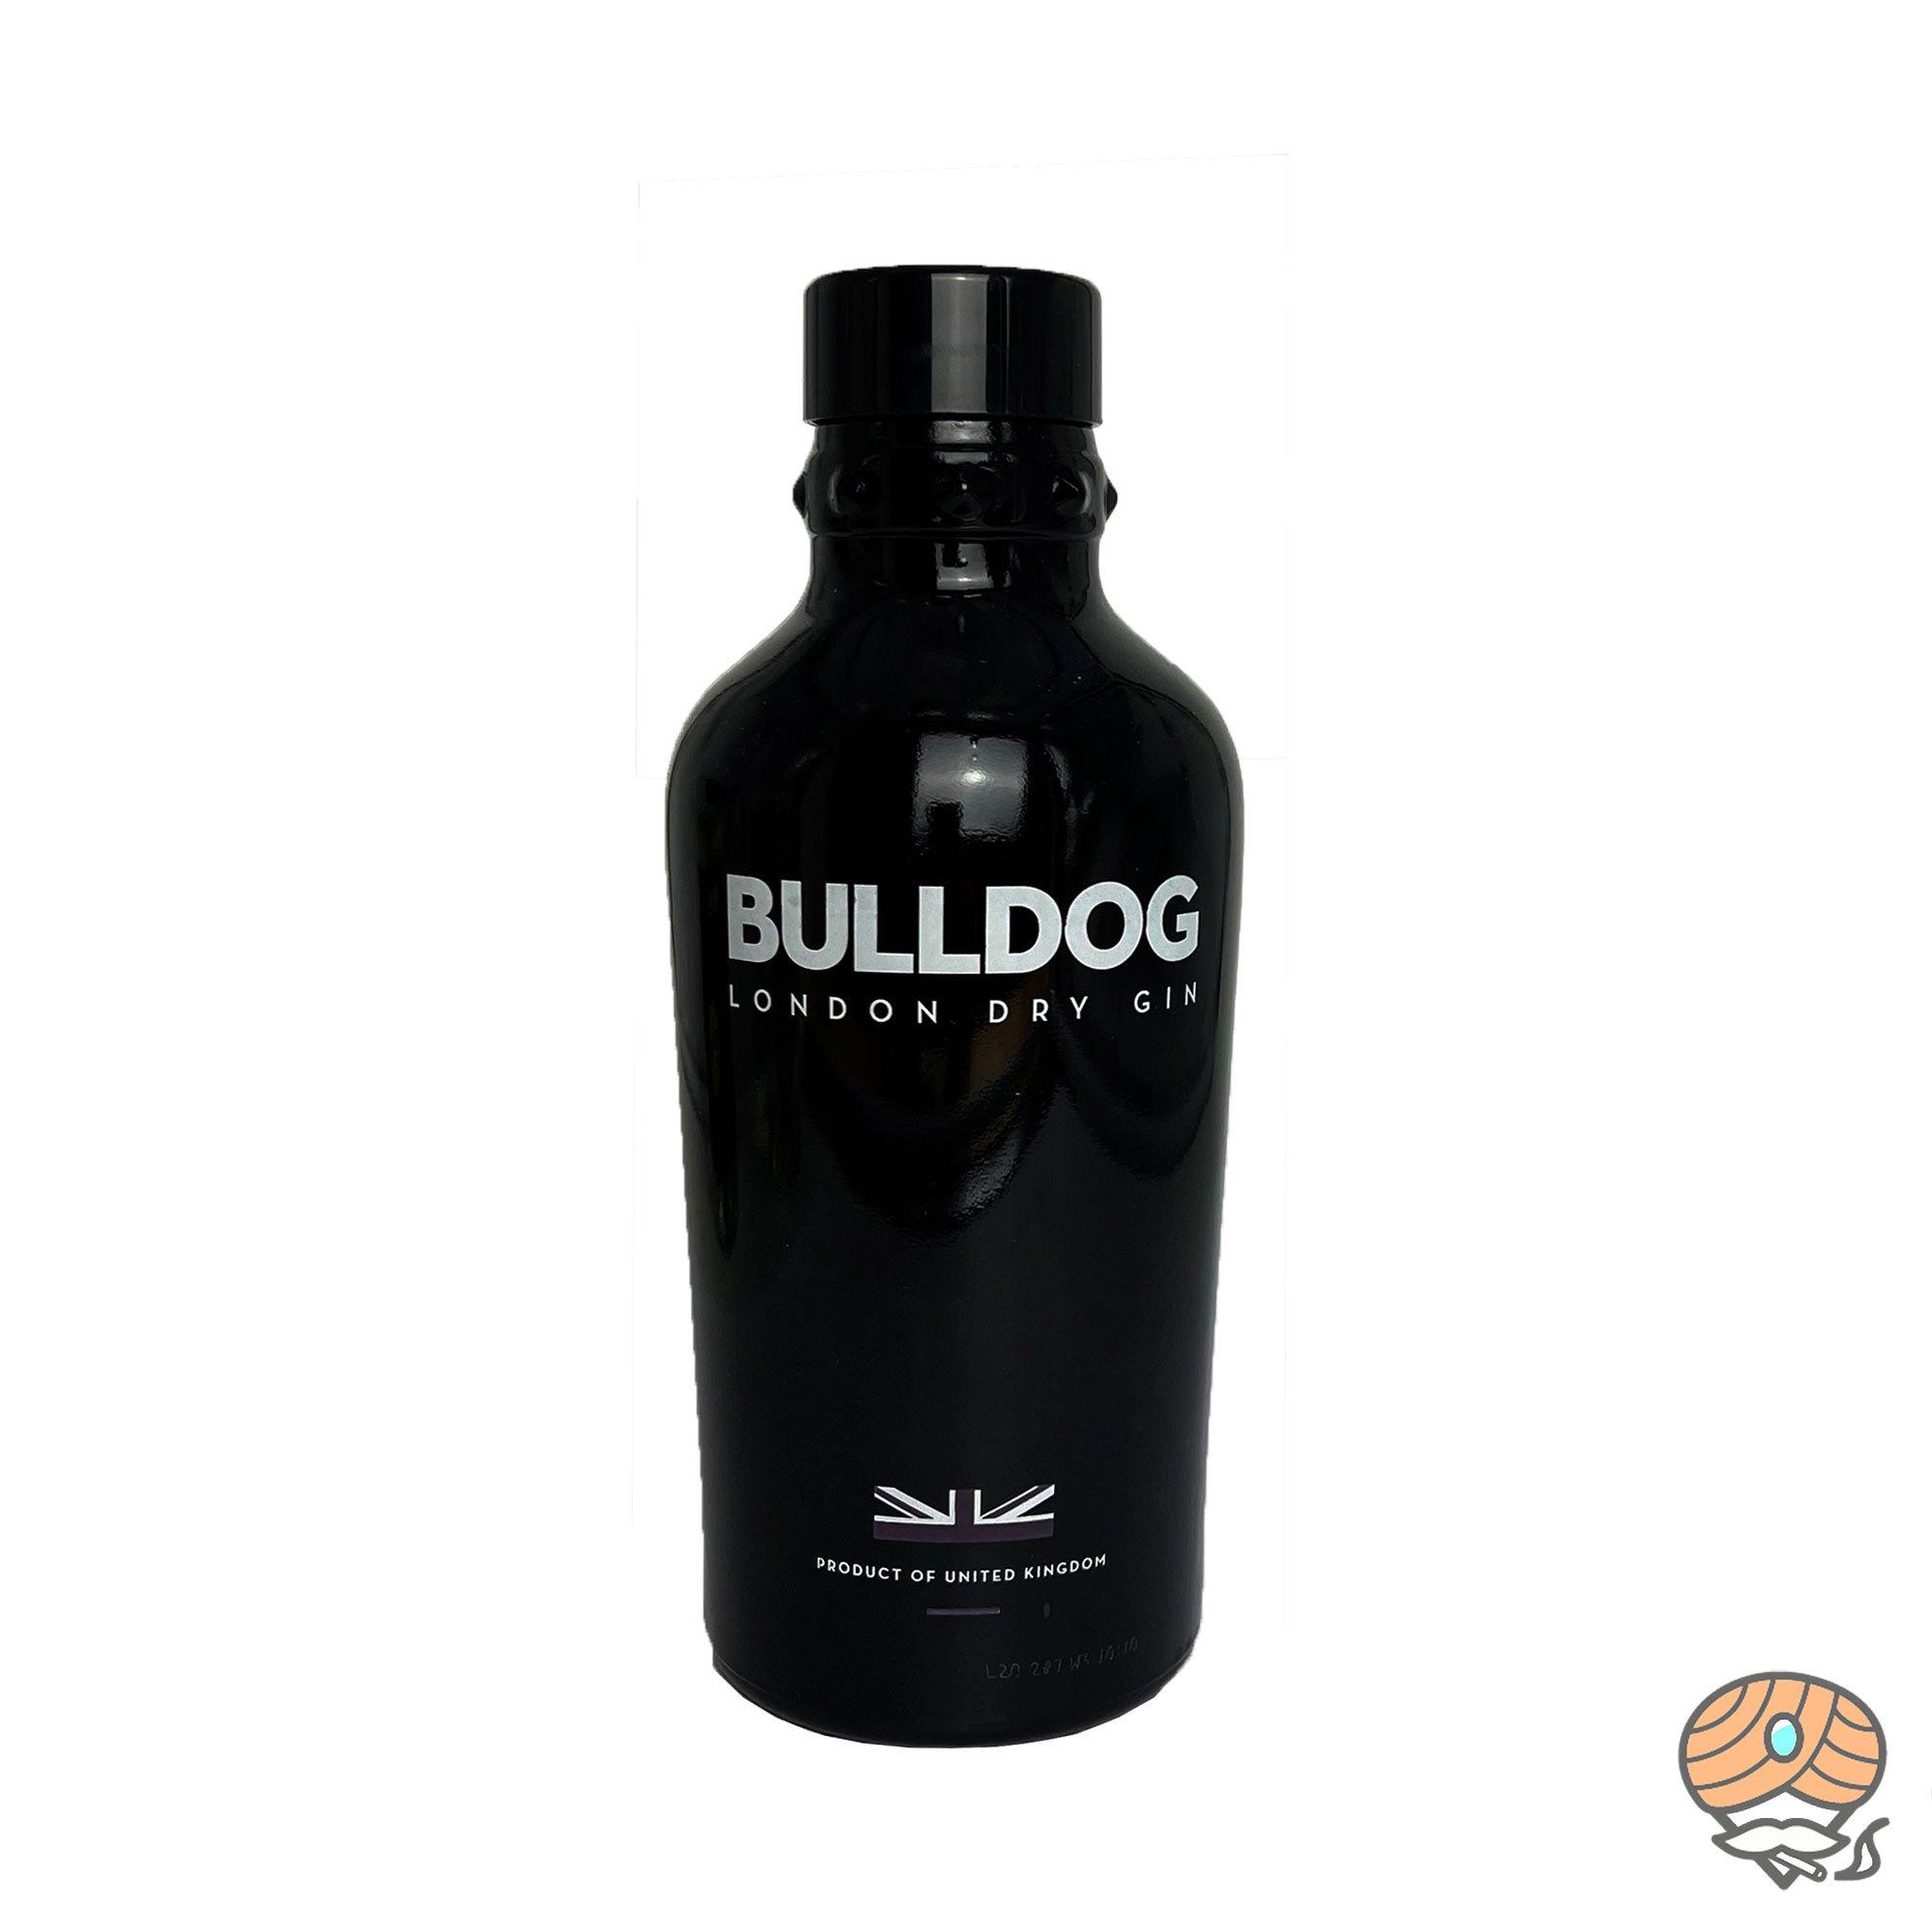 Bulldog London Dry Gin 0,7l, alc. 40 Vol.-%